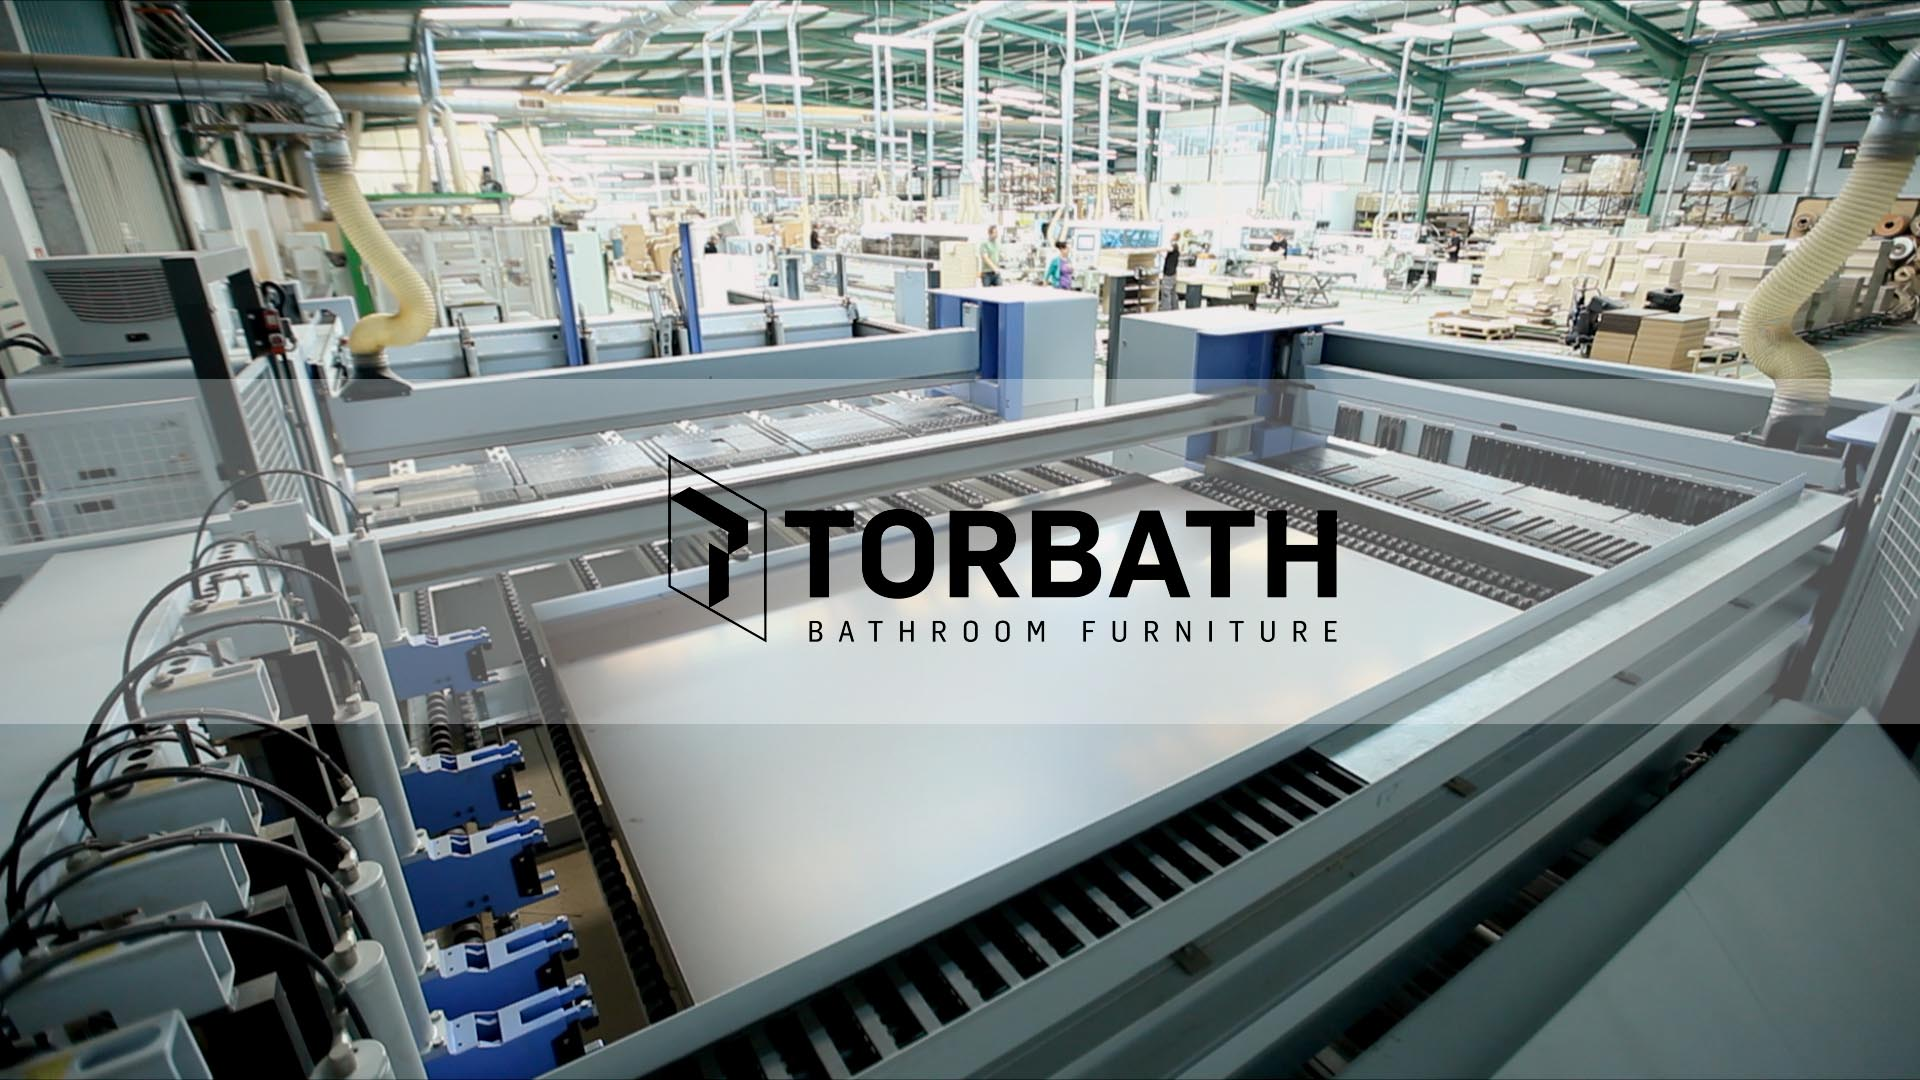 cartela-torbath